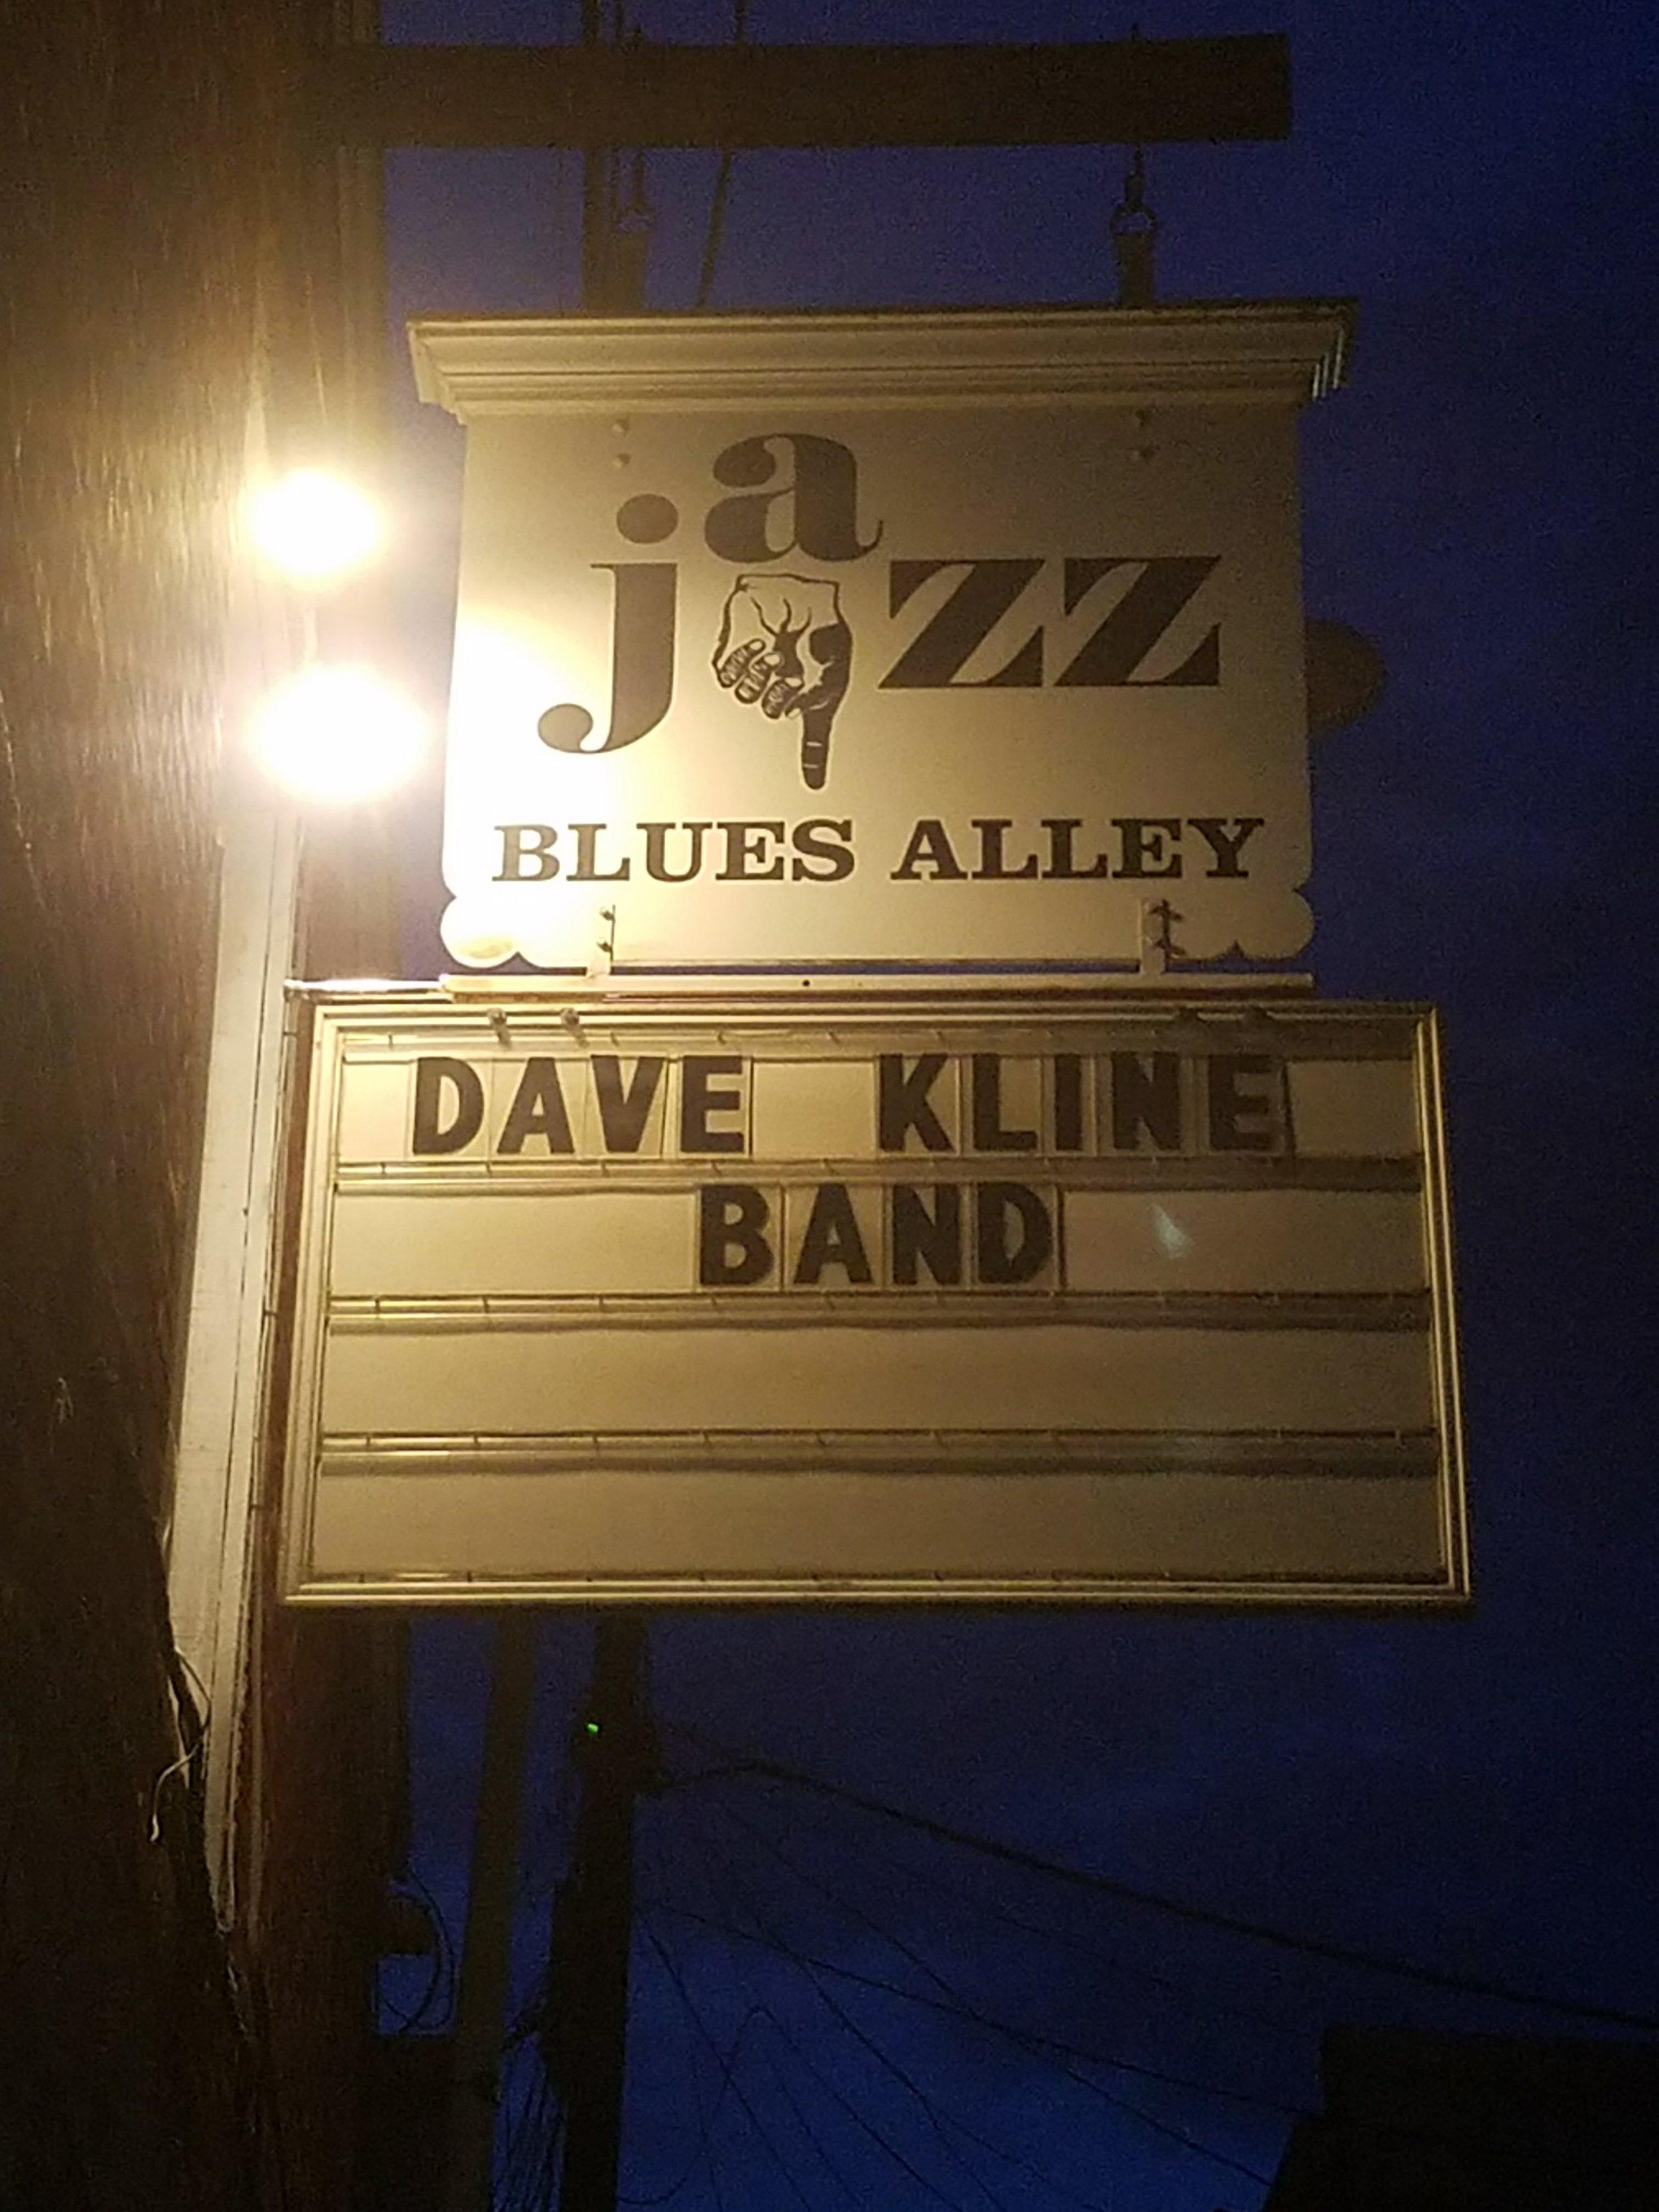 dave kline band blues alley